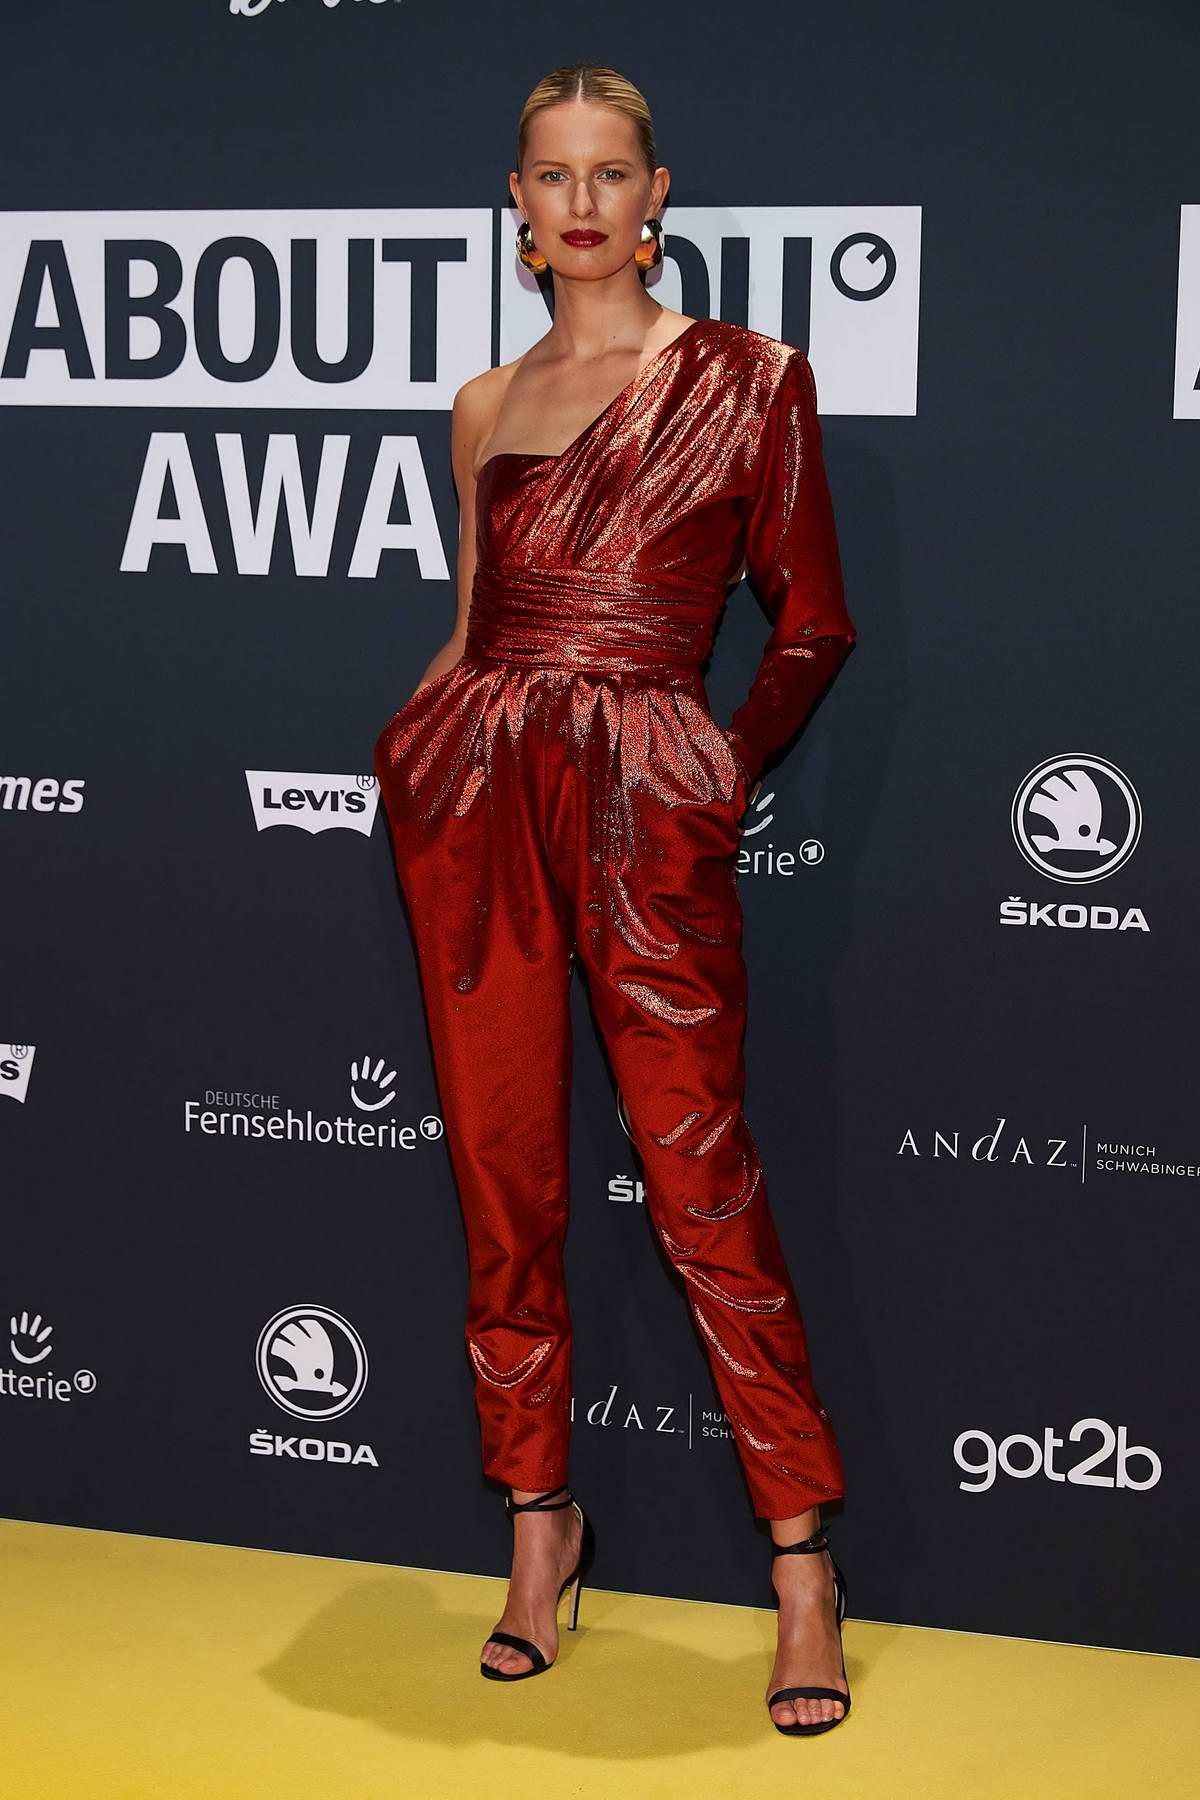 Karolina Kurkova attends the 2019 About You Awards at Bavaria Studios in Munich, Germany